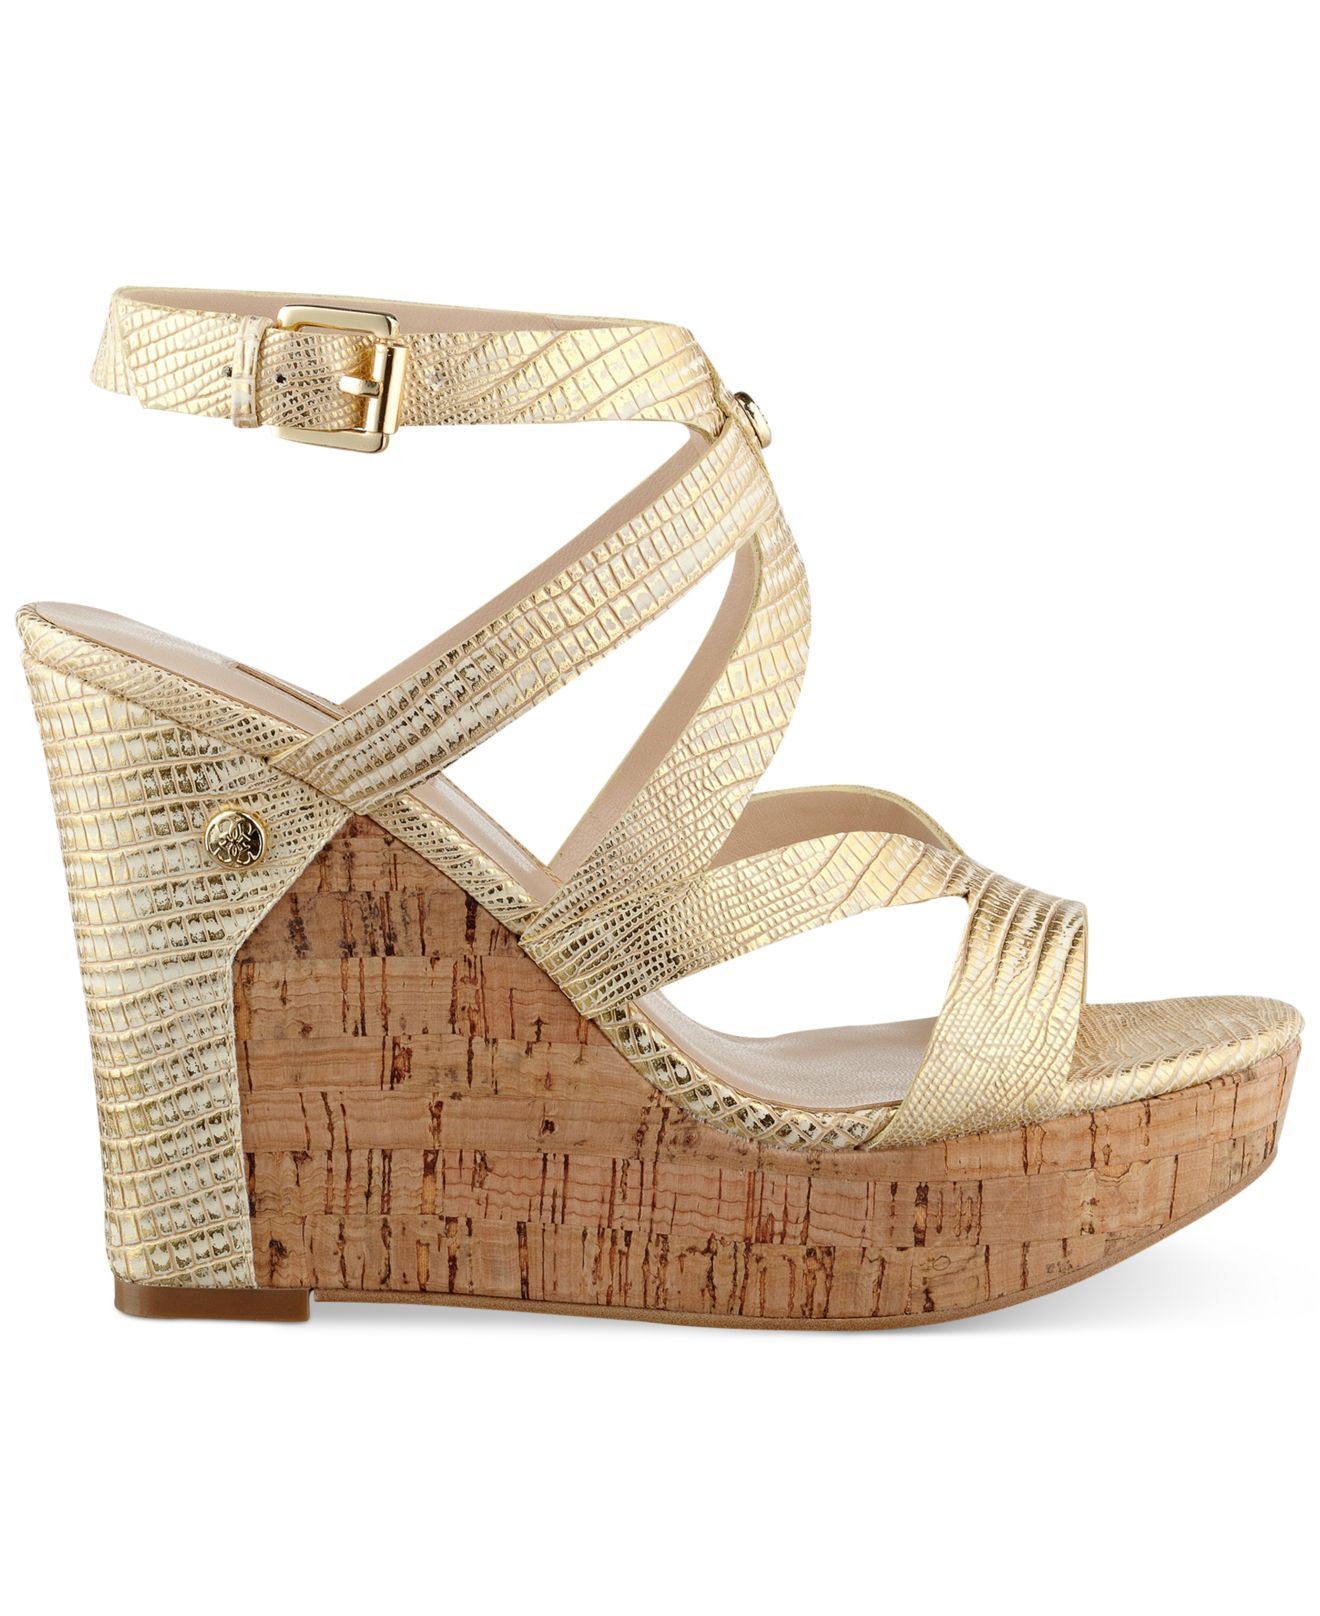 726813456b3 Lyst - Guess Women S Harlee Cork Platform Wedge Sandals in Metallic